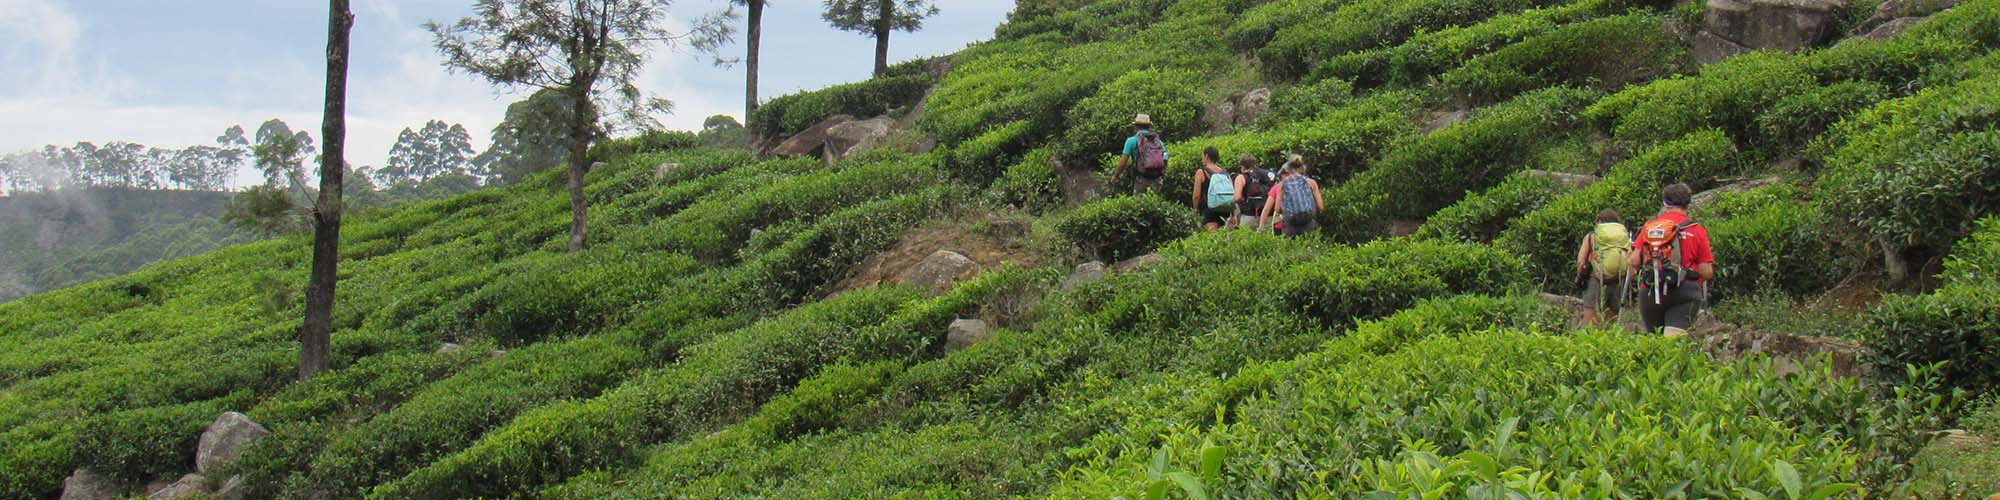 Trek, plantations de thé, Haputale, Sri Lanka